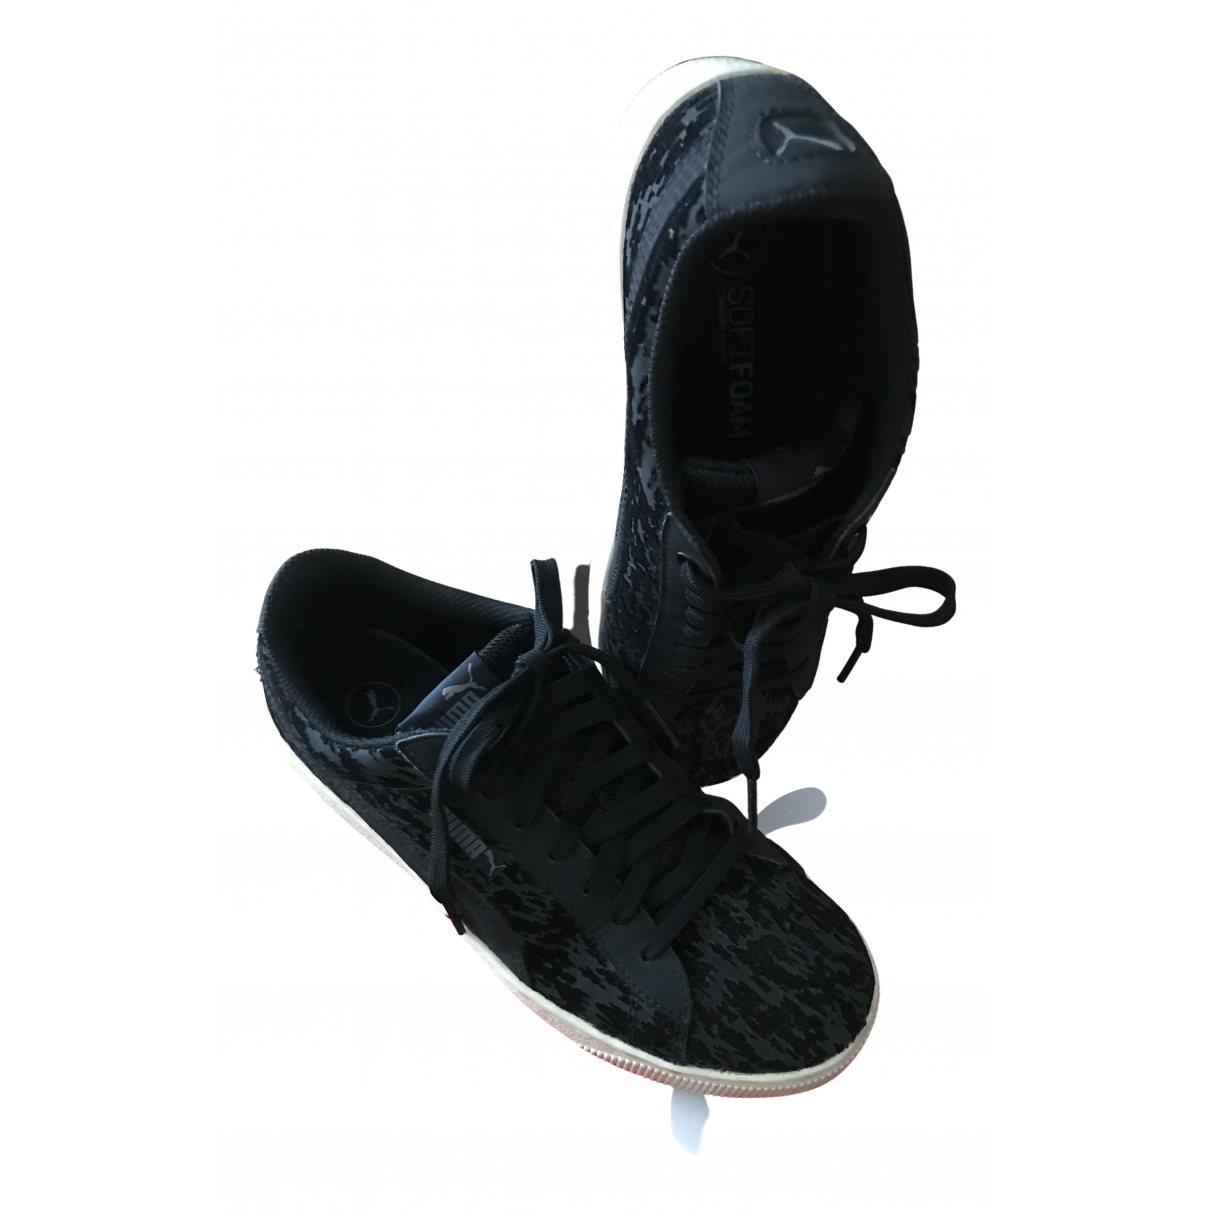 Puma N Black Cloth Trainers for Women 38 EU